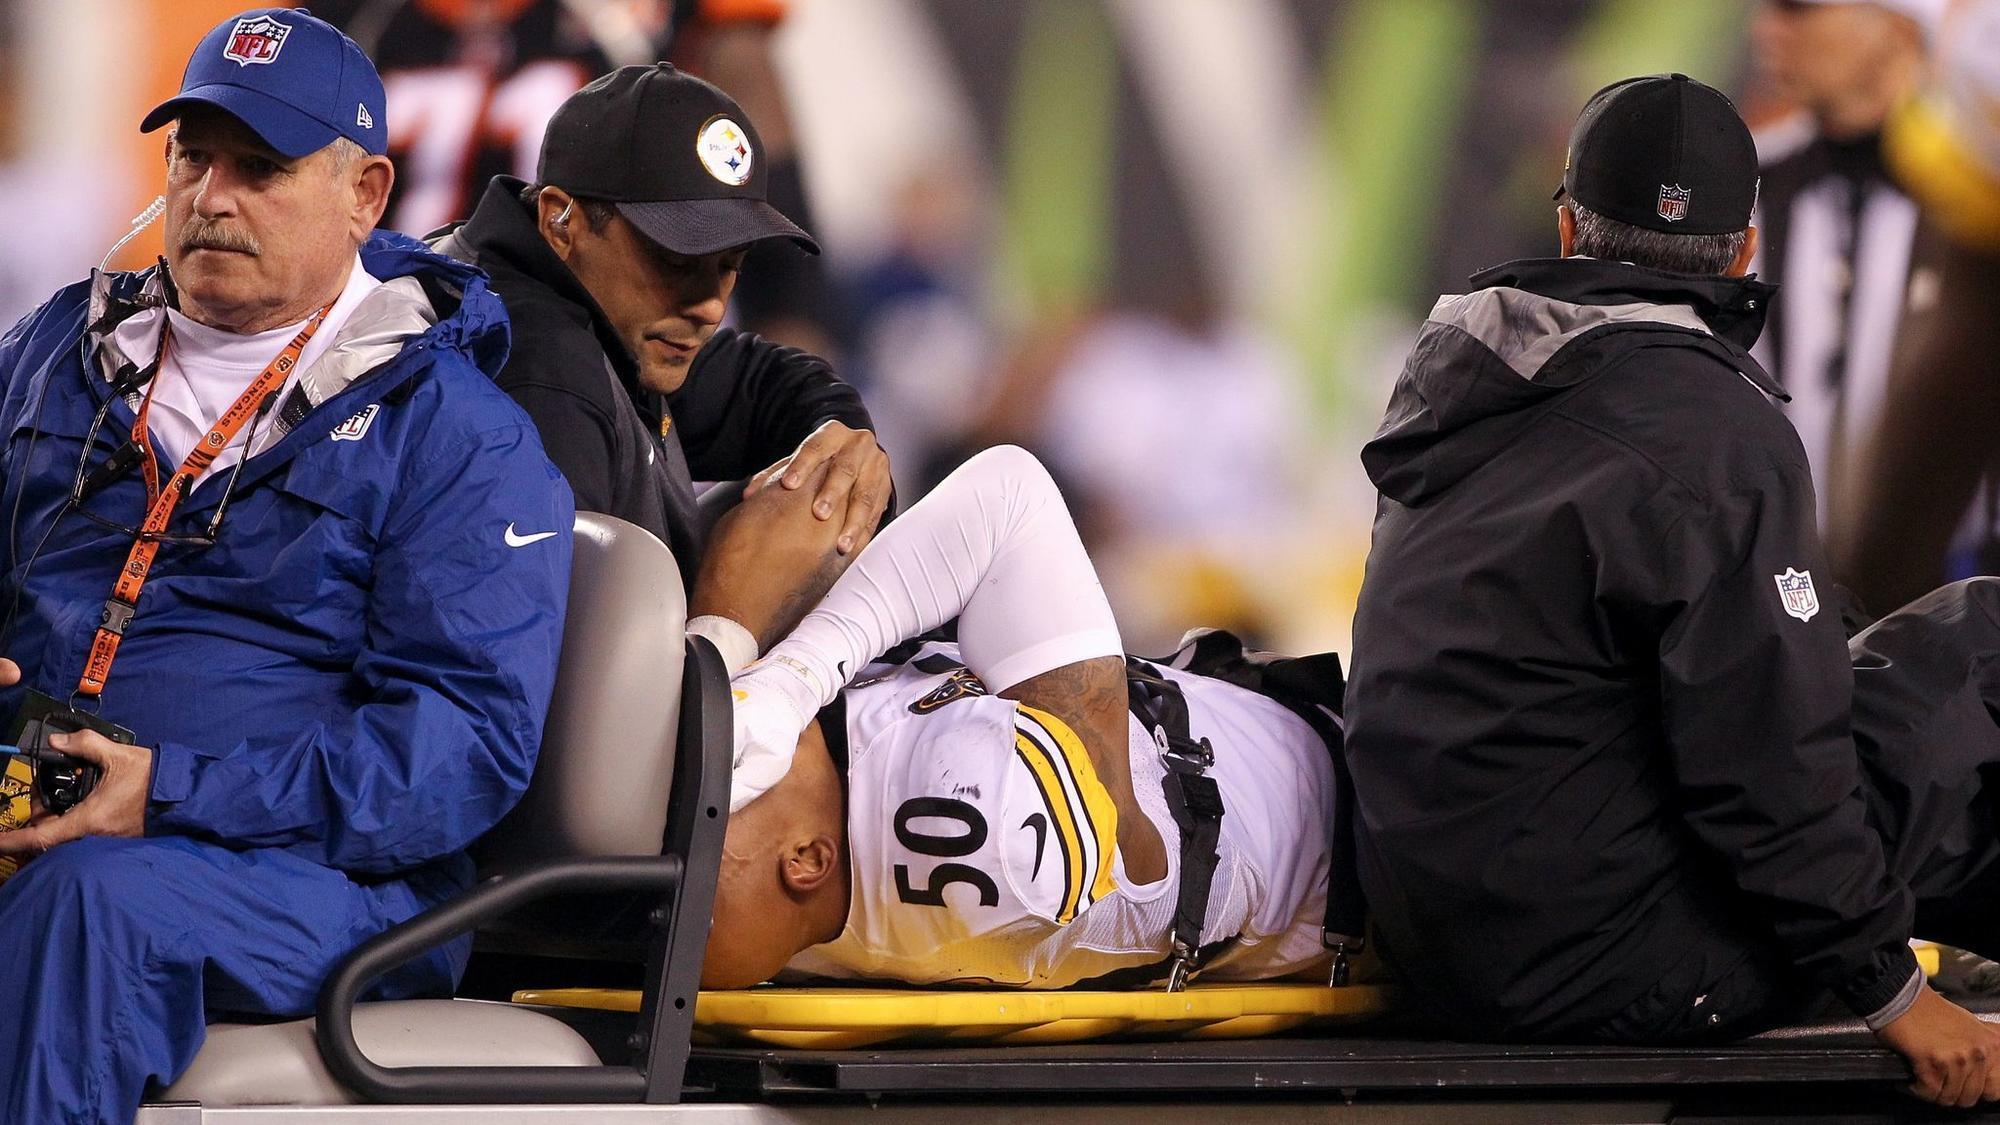 Ravens wish speedy recovery for Steelers linebacker Ryan Shazier